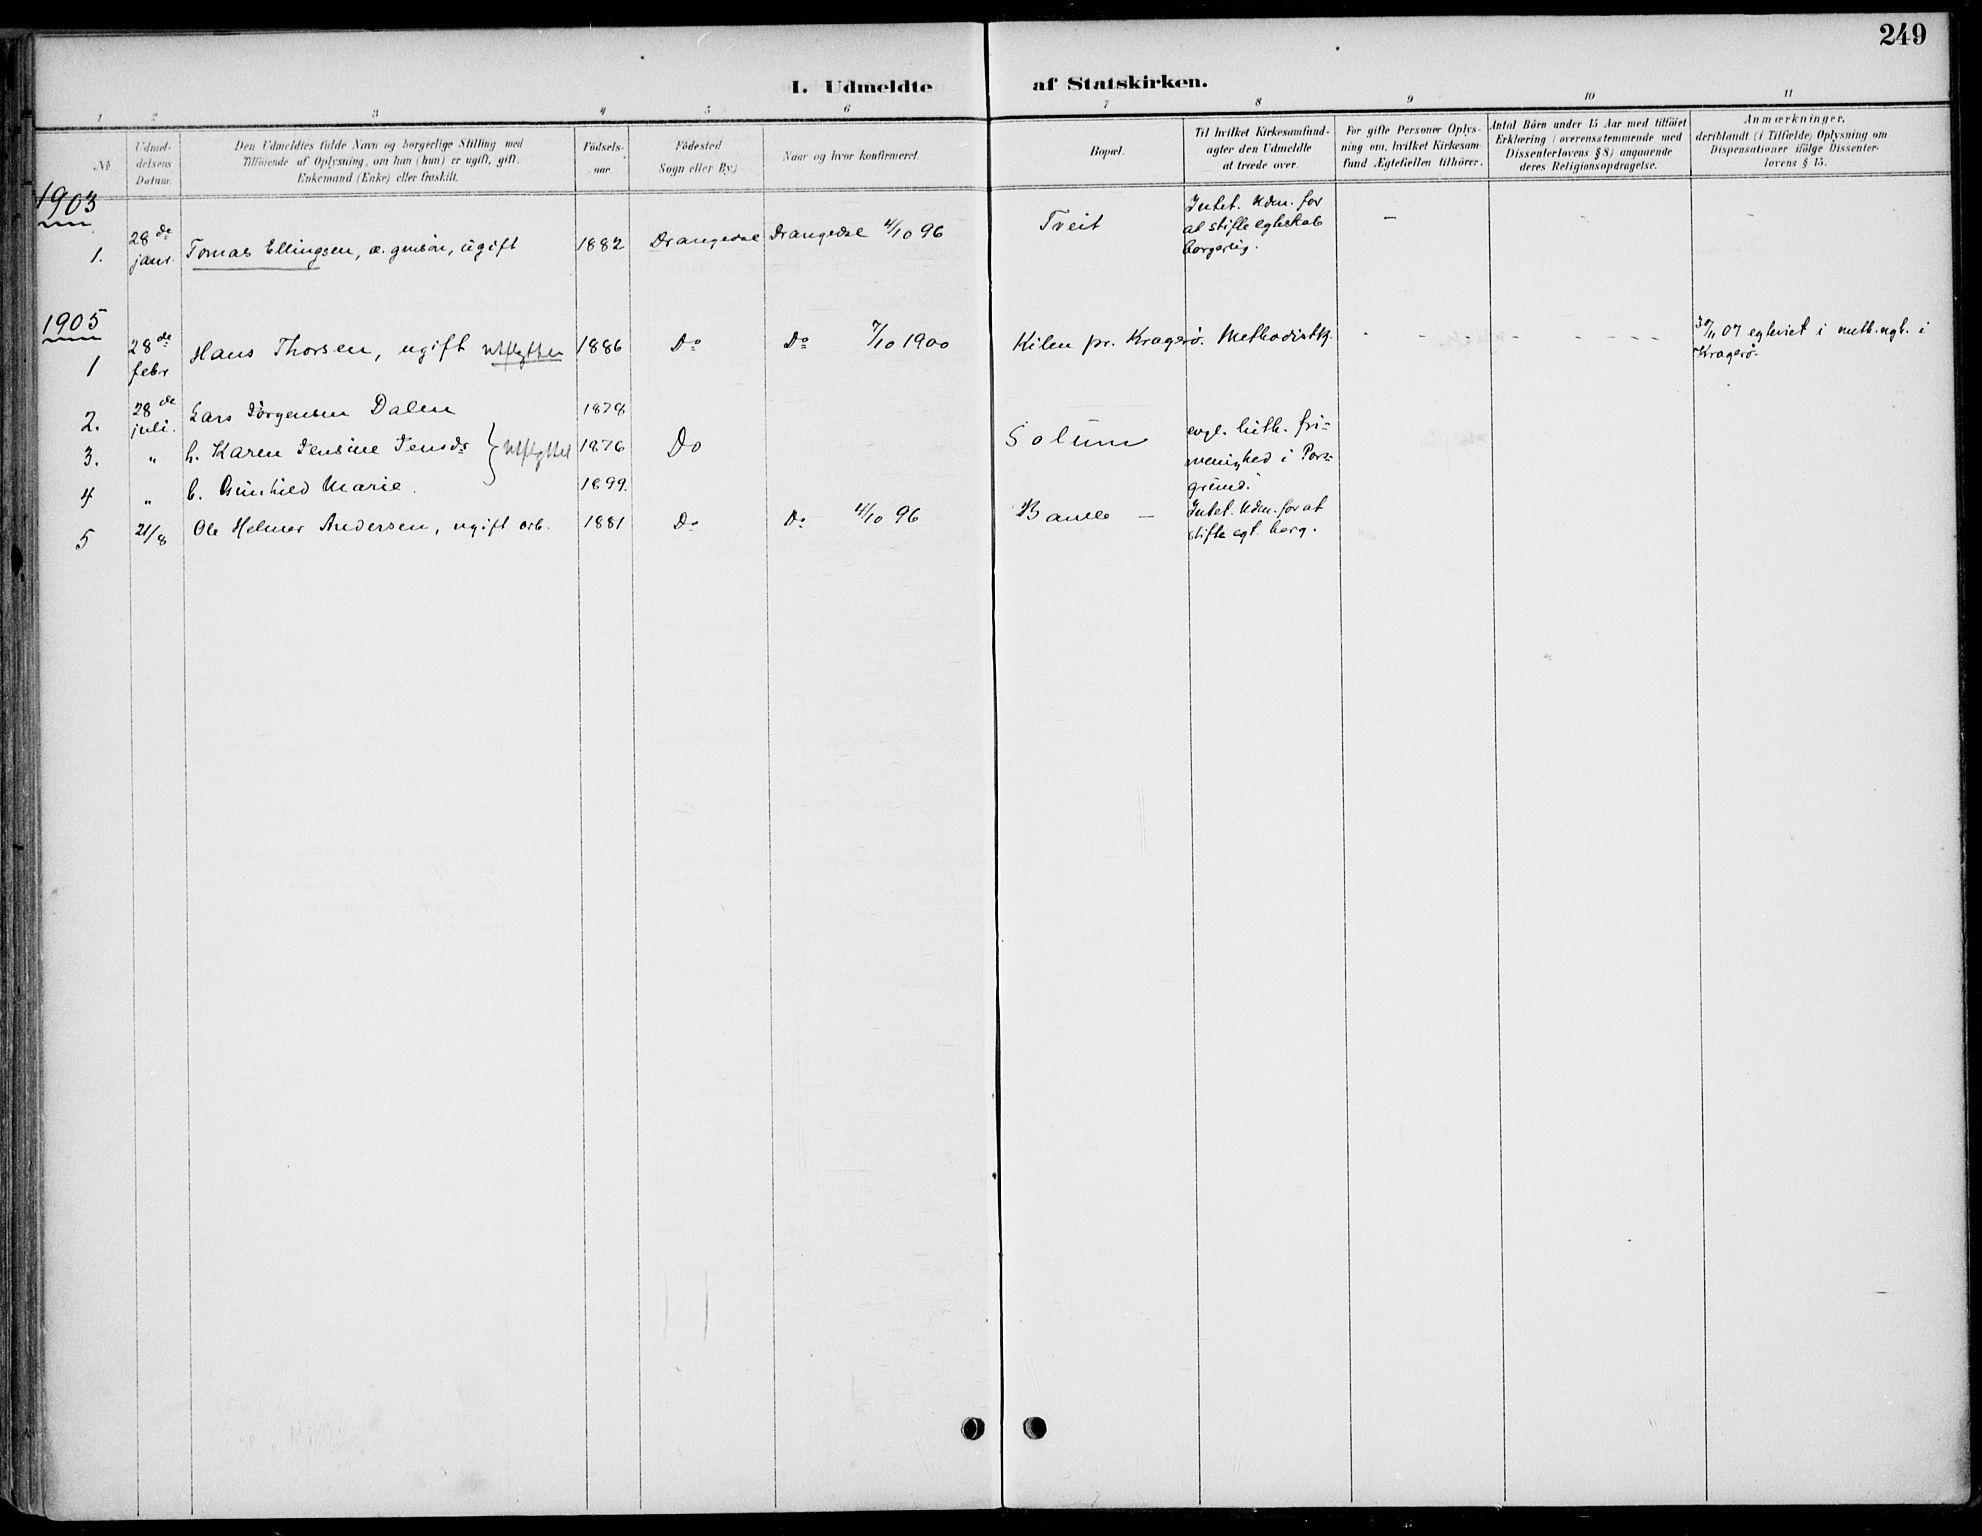 SAKO, Drangedal kirkebøker, F/Fa/L0012: Ministerialbok nr. 12, 1895-1905, s. 249